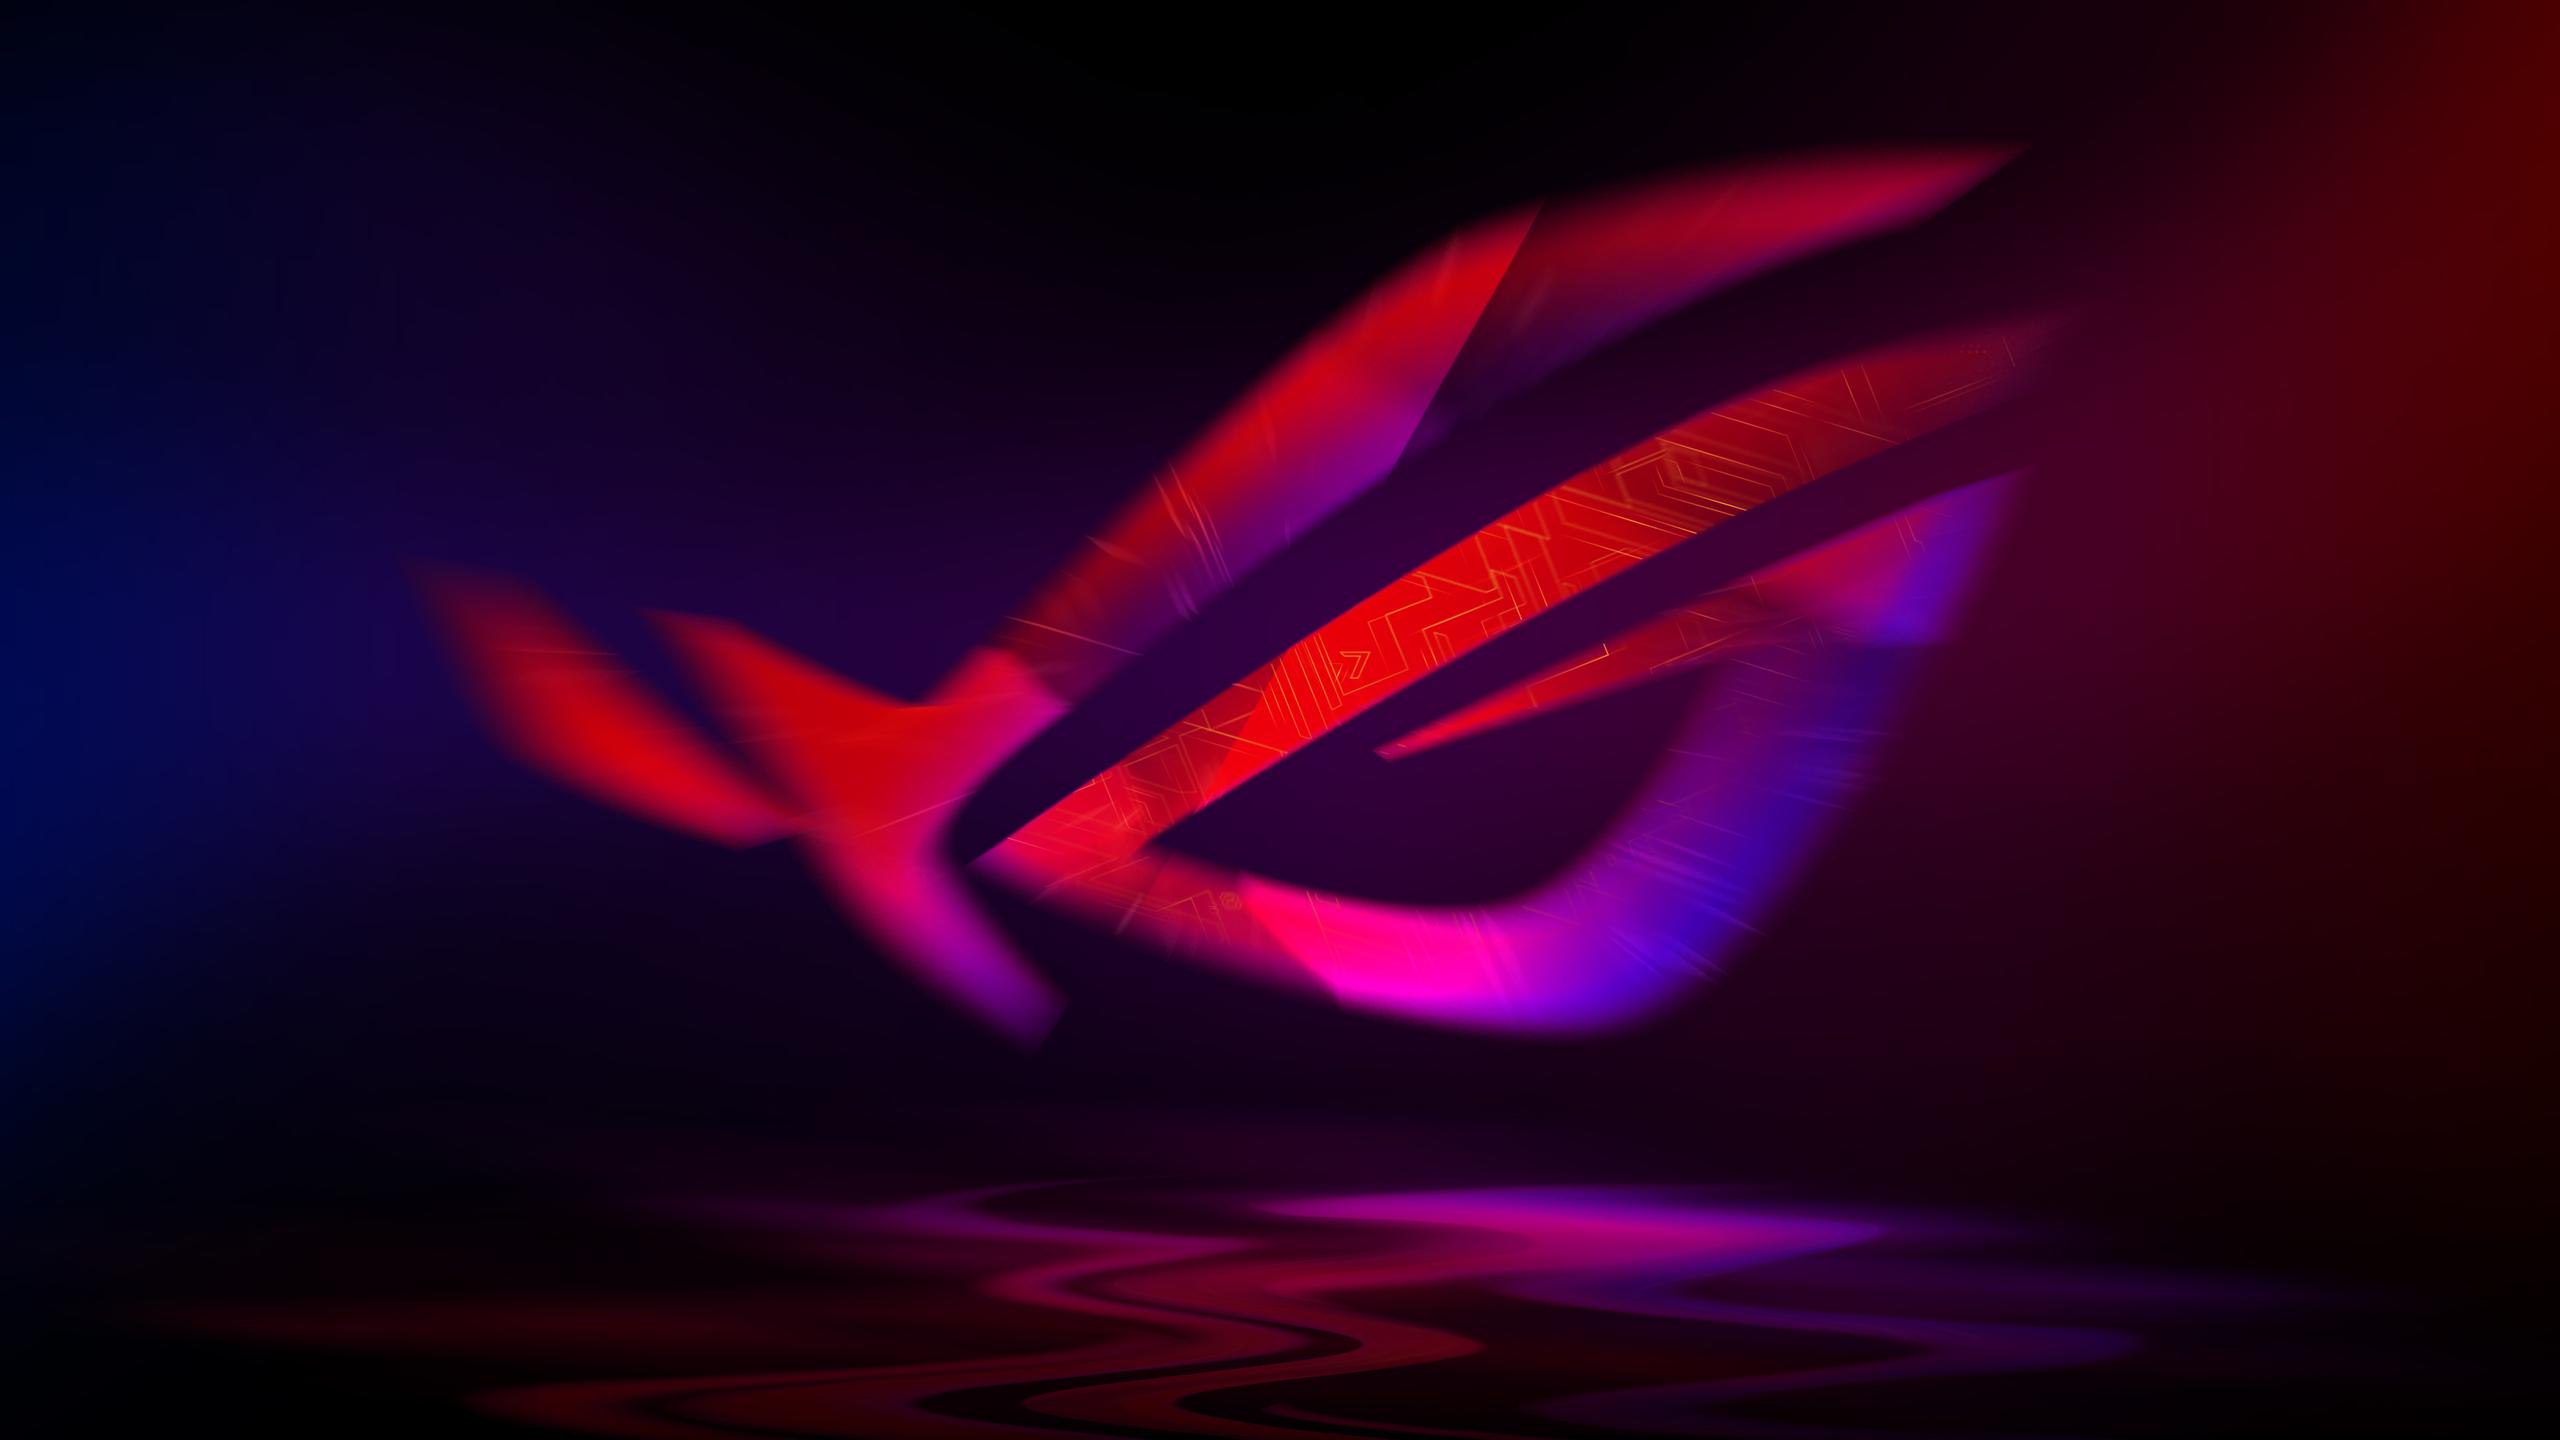 2560x1440 Republic Of Gamers Logo 4k 1440p Resolution Hd 4k